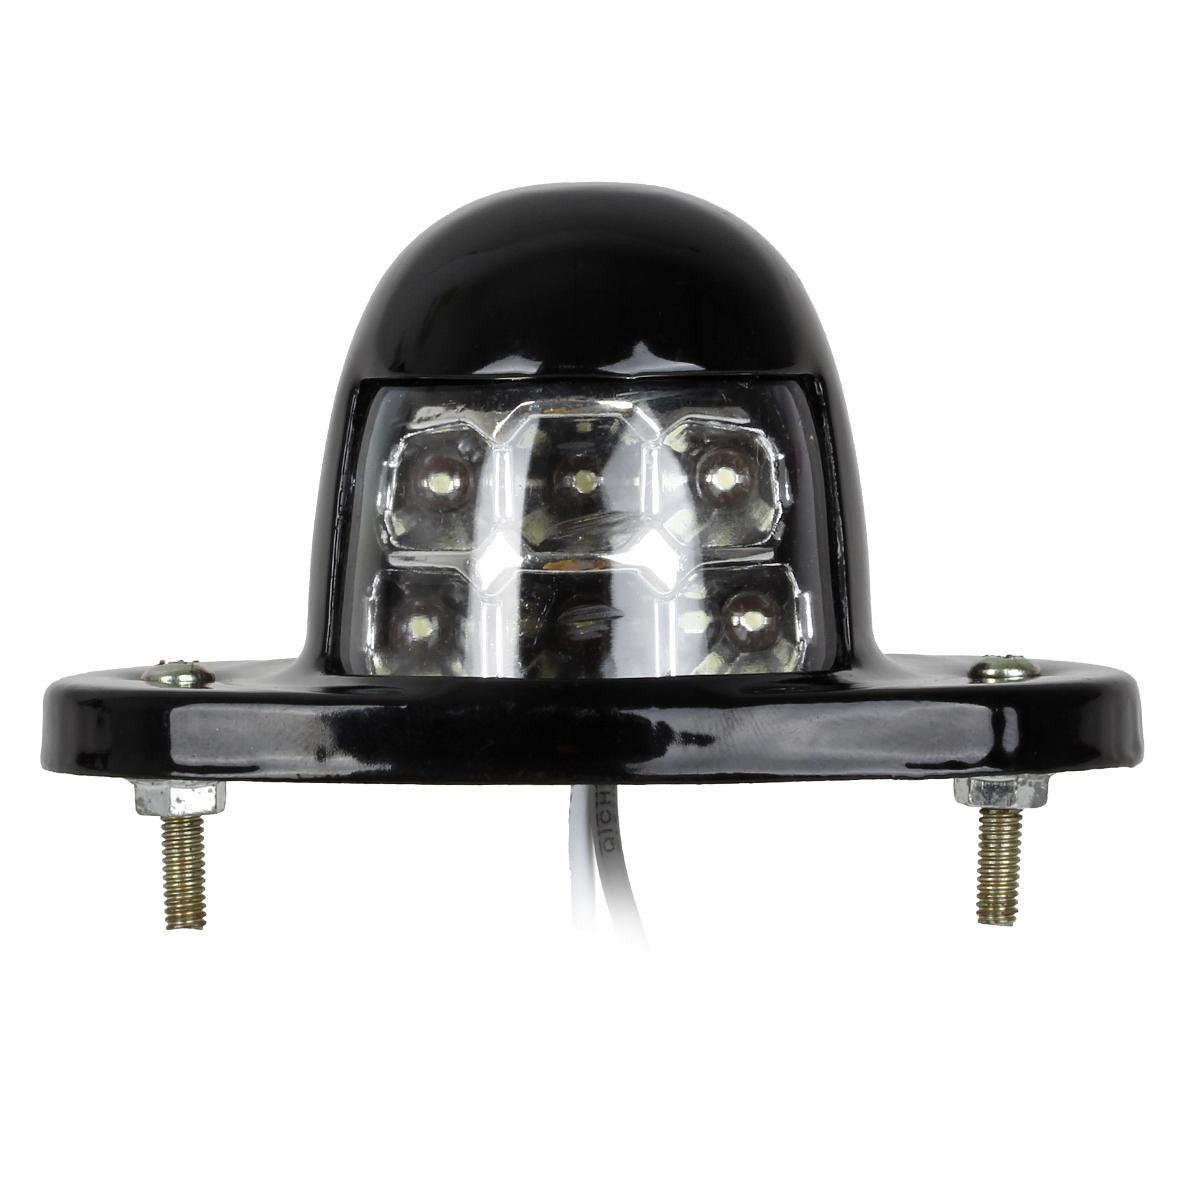 2pcs Universal LED License Plate Light Wiring Lamp For Car